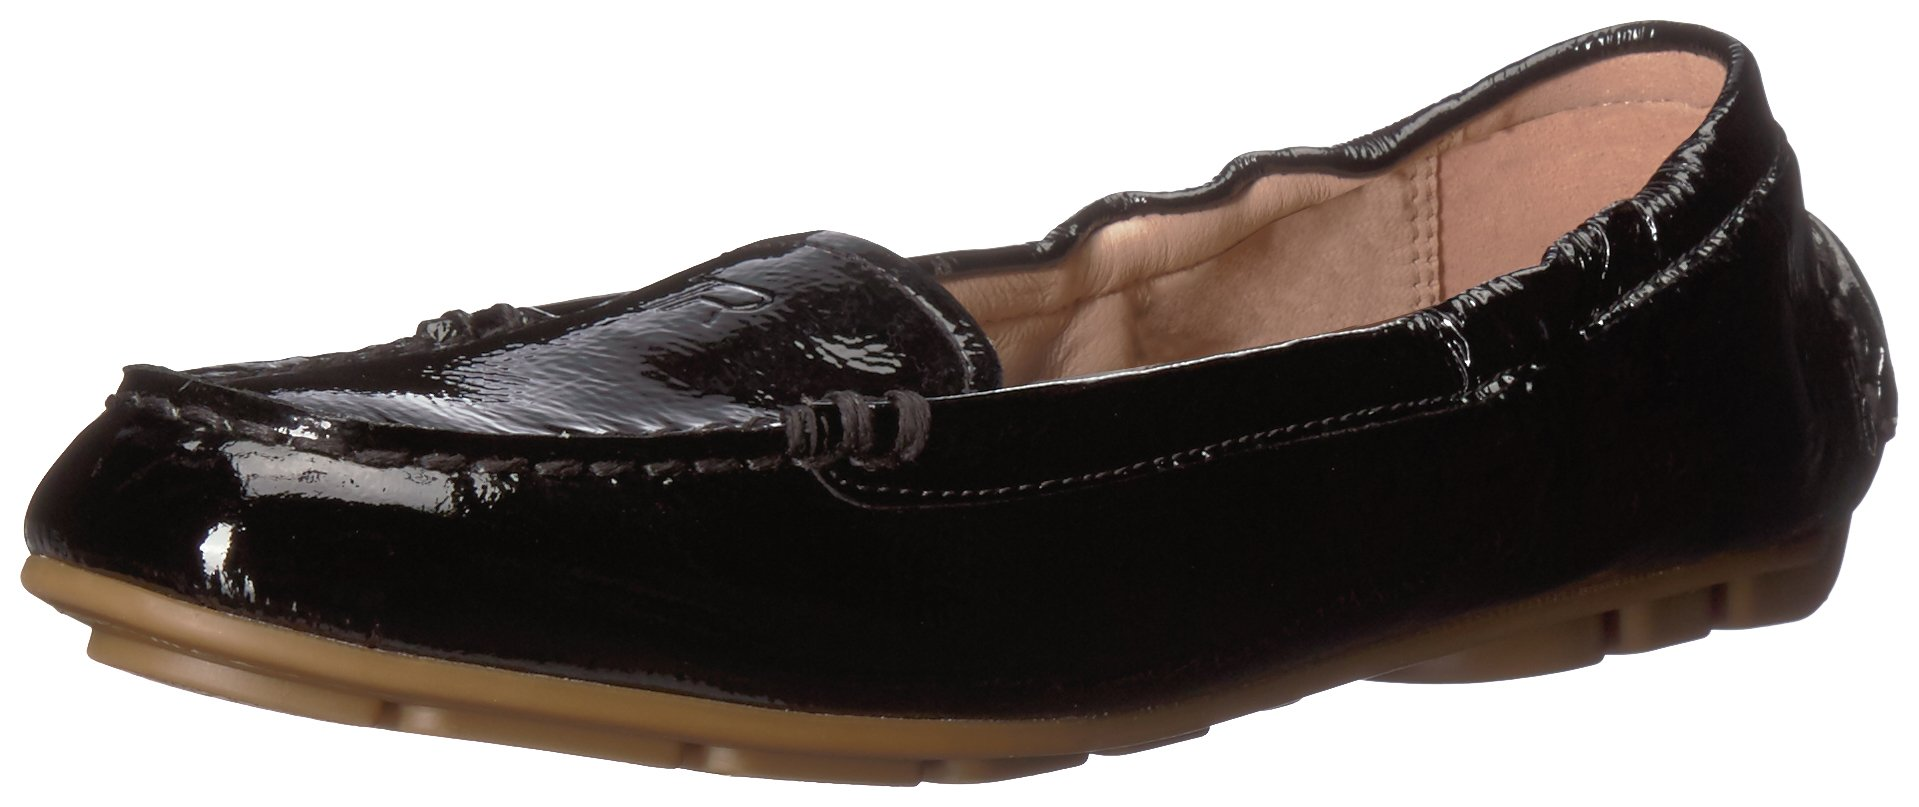 Taryn Rose Women's Kristine Crinkled Patent Driving Style Loafer, Black, 6 M M US